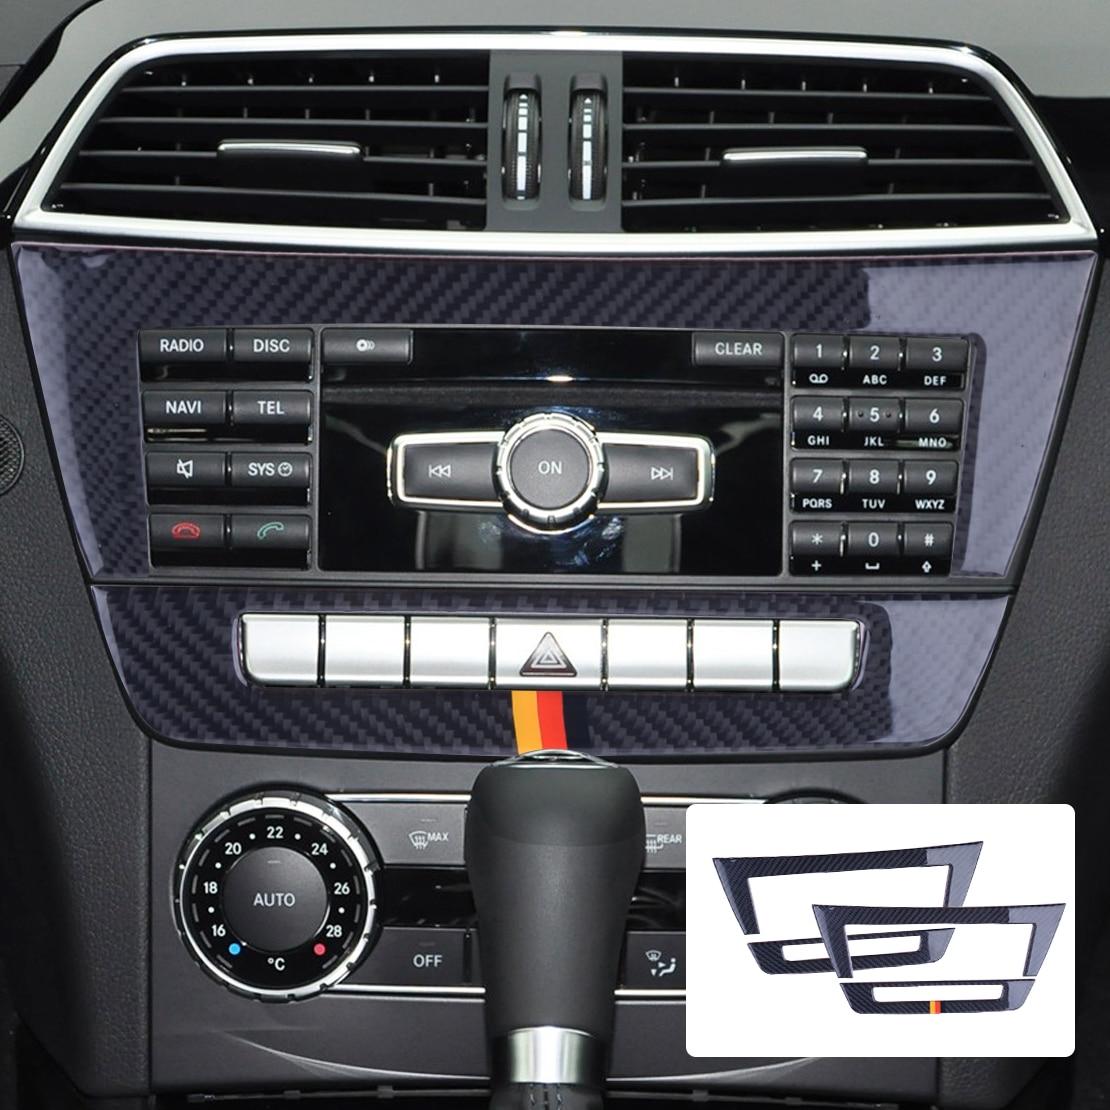 beler 2pcs Car Central Control CD Panels Decor Sticker Cover Trim Frame Decorative Fit For Mercedes Benz W204 2010 2013